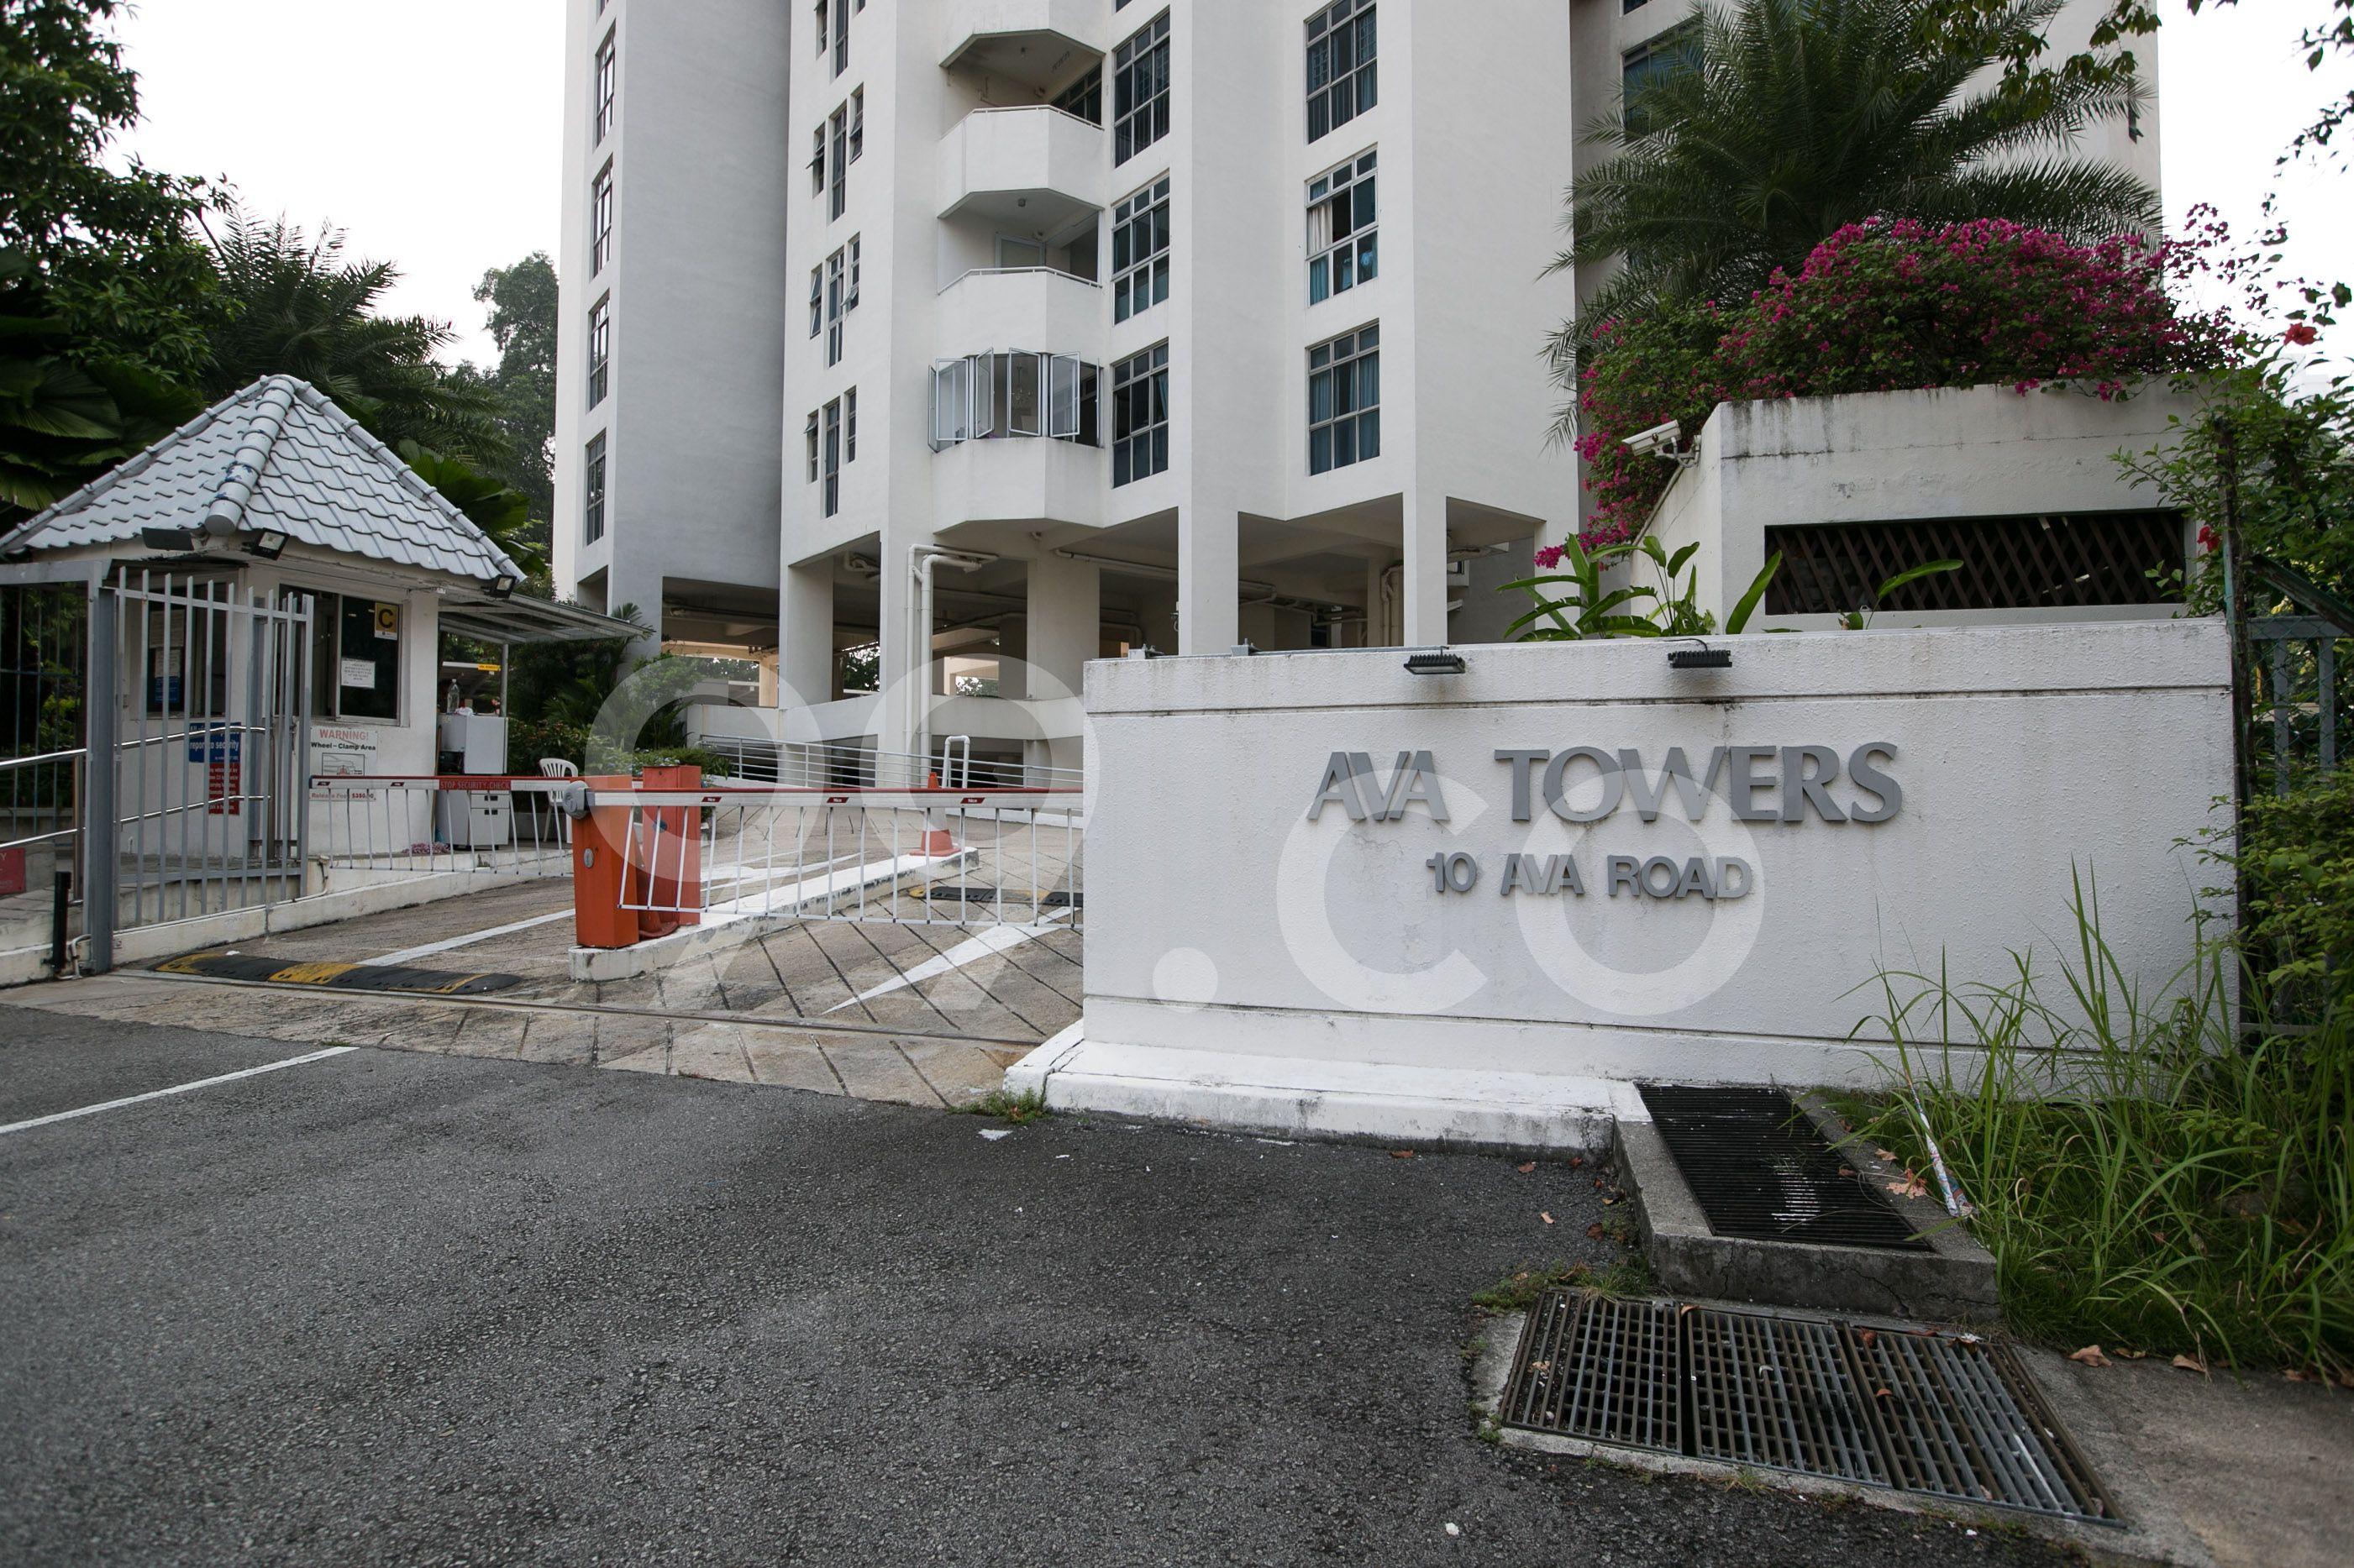 Ava Towers Ava Towers - Entrance